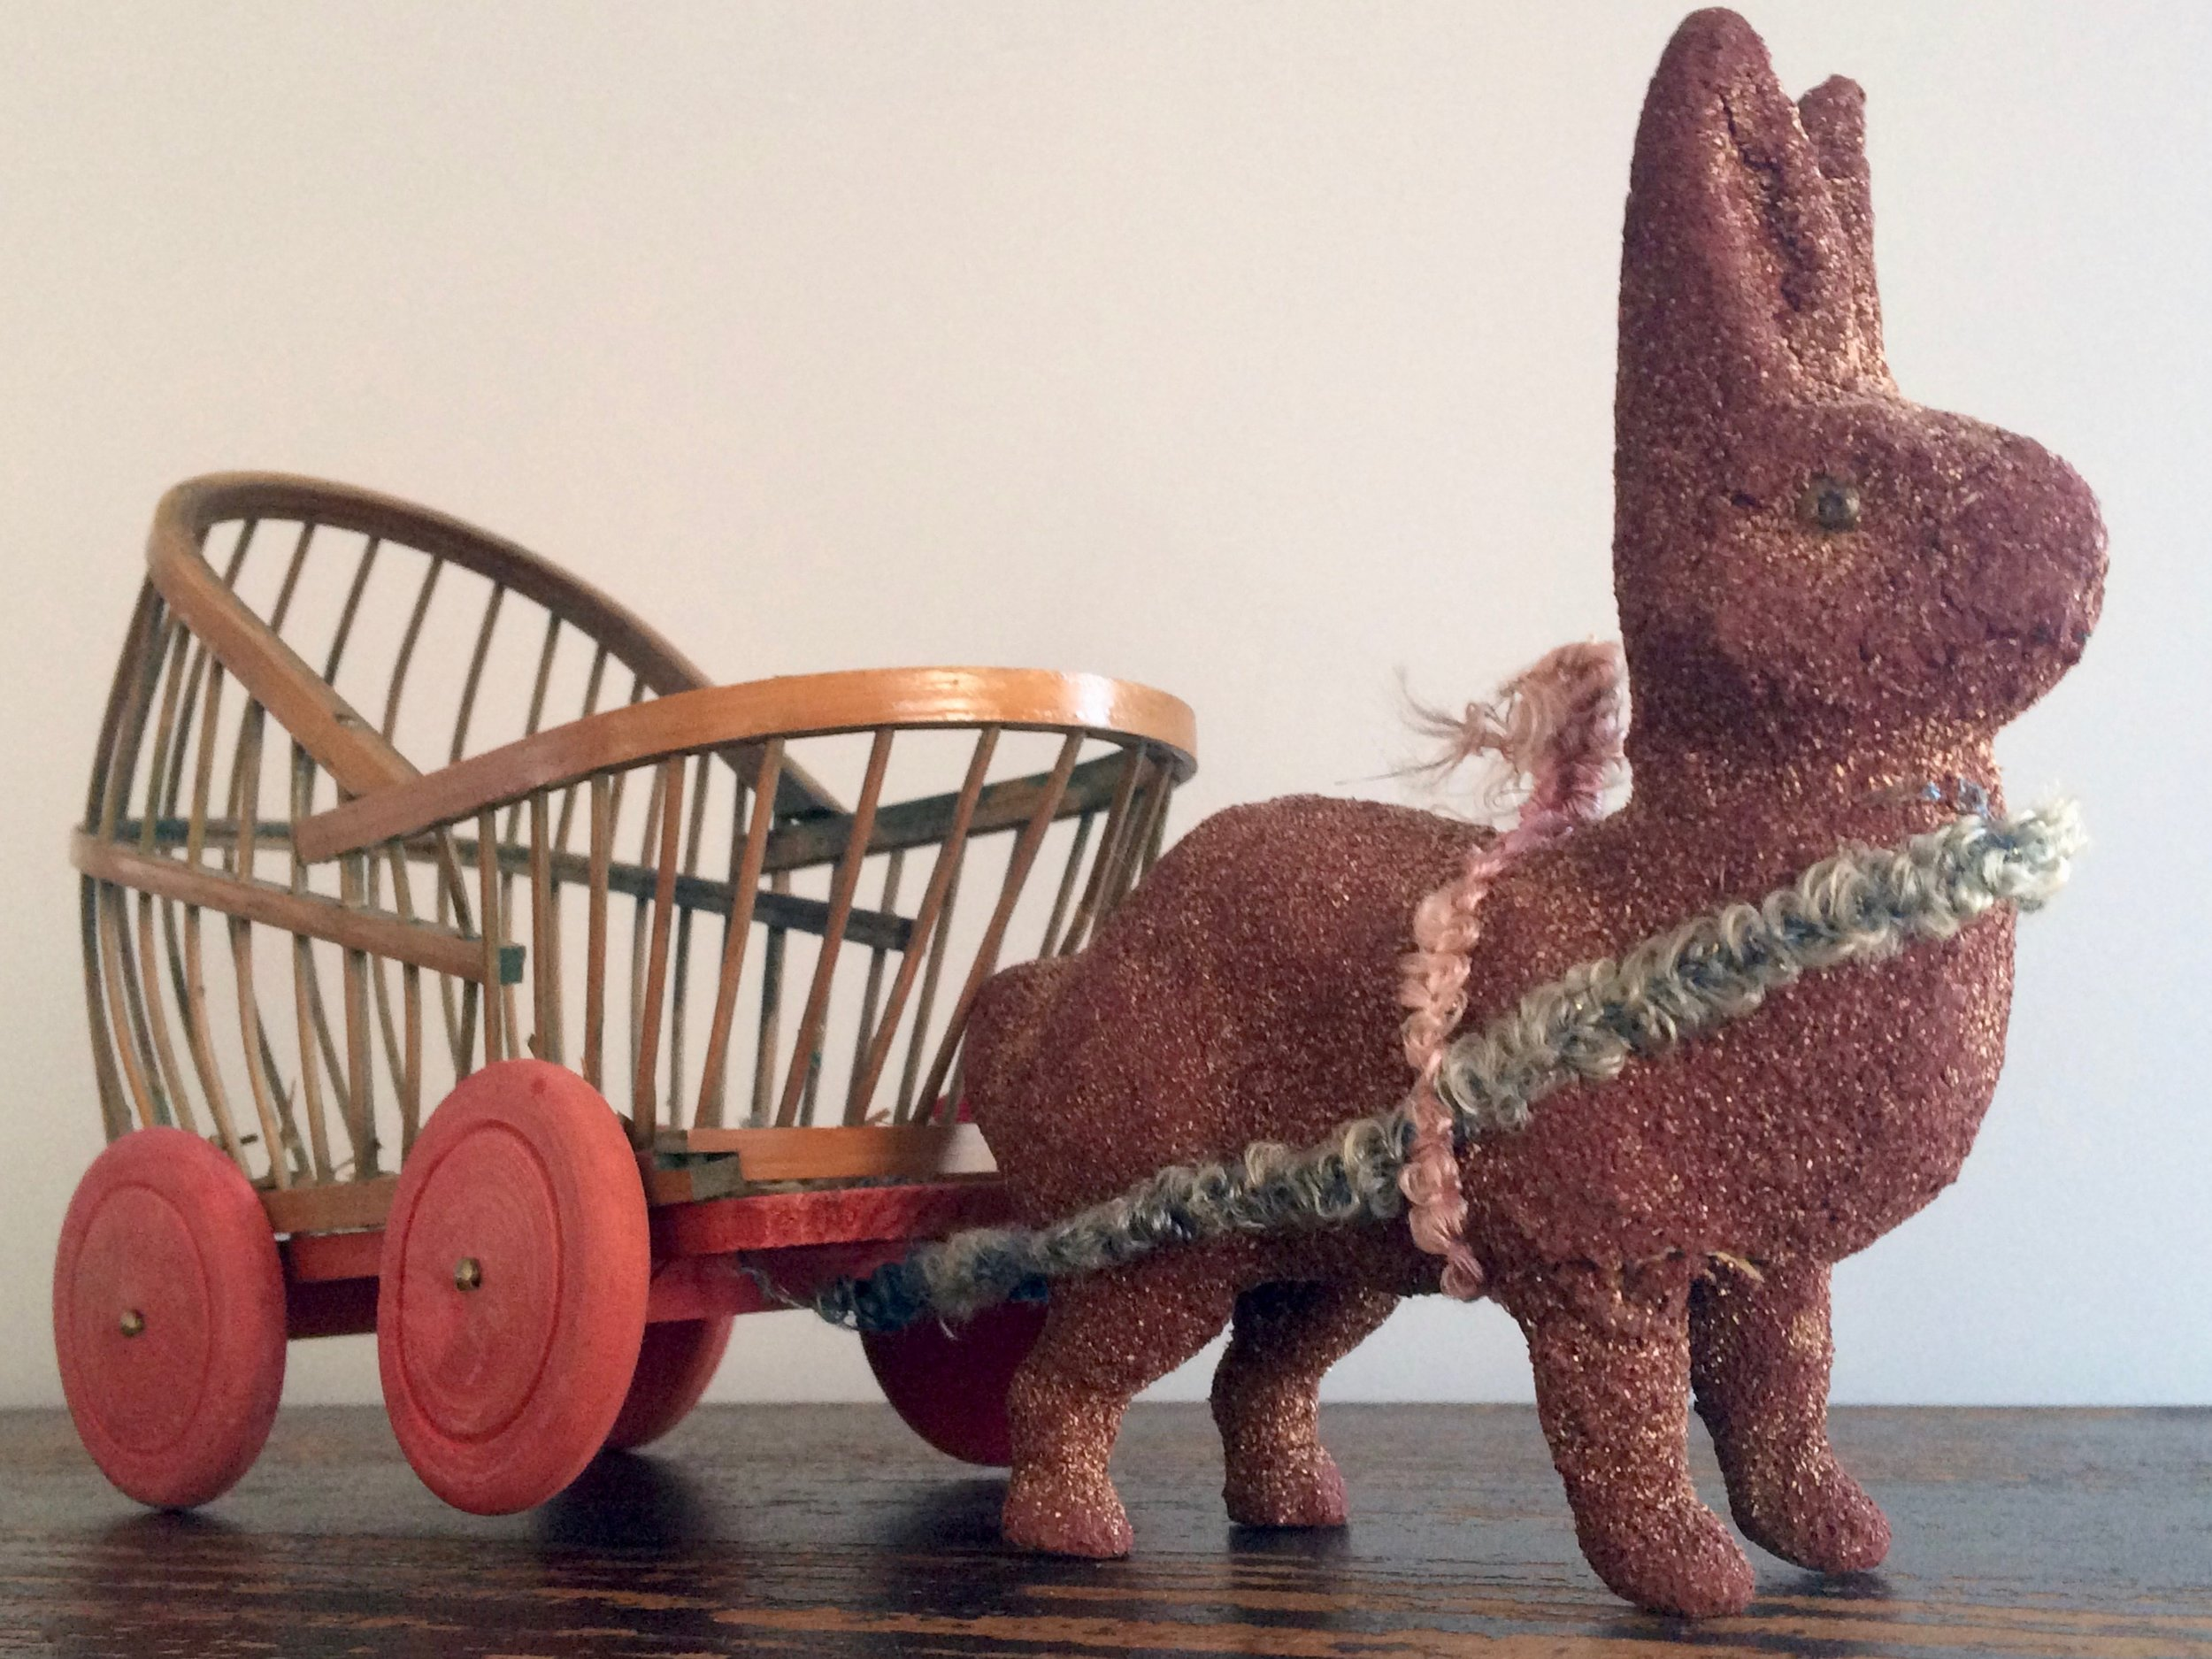 Flocked Rabbit with Cart